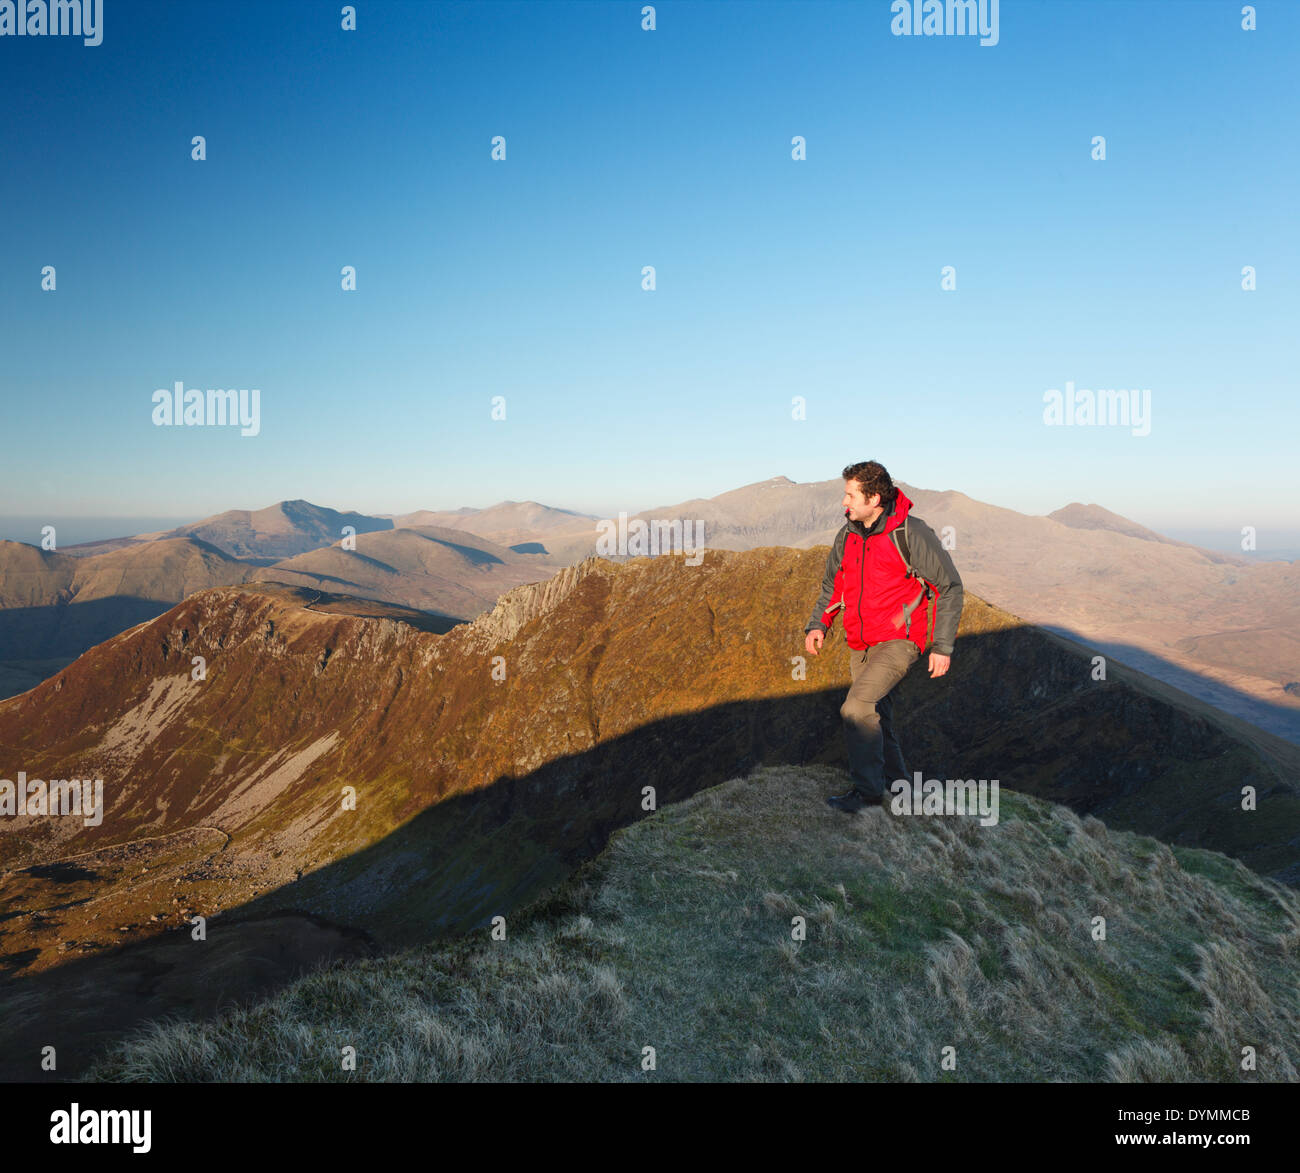 Hillwalker on the Nantlle Ridge. Snowdonia National Park. Wales. UK. - Stock Image